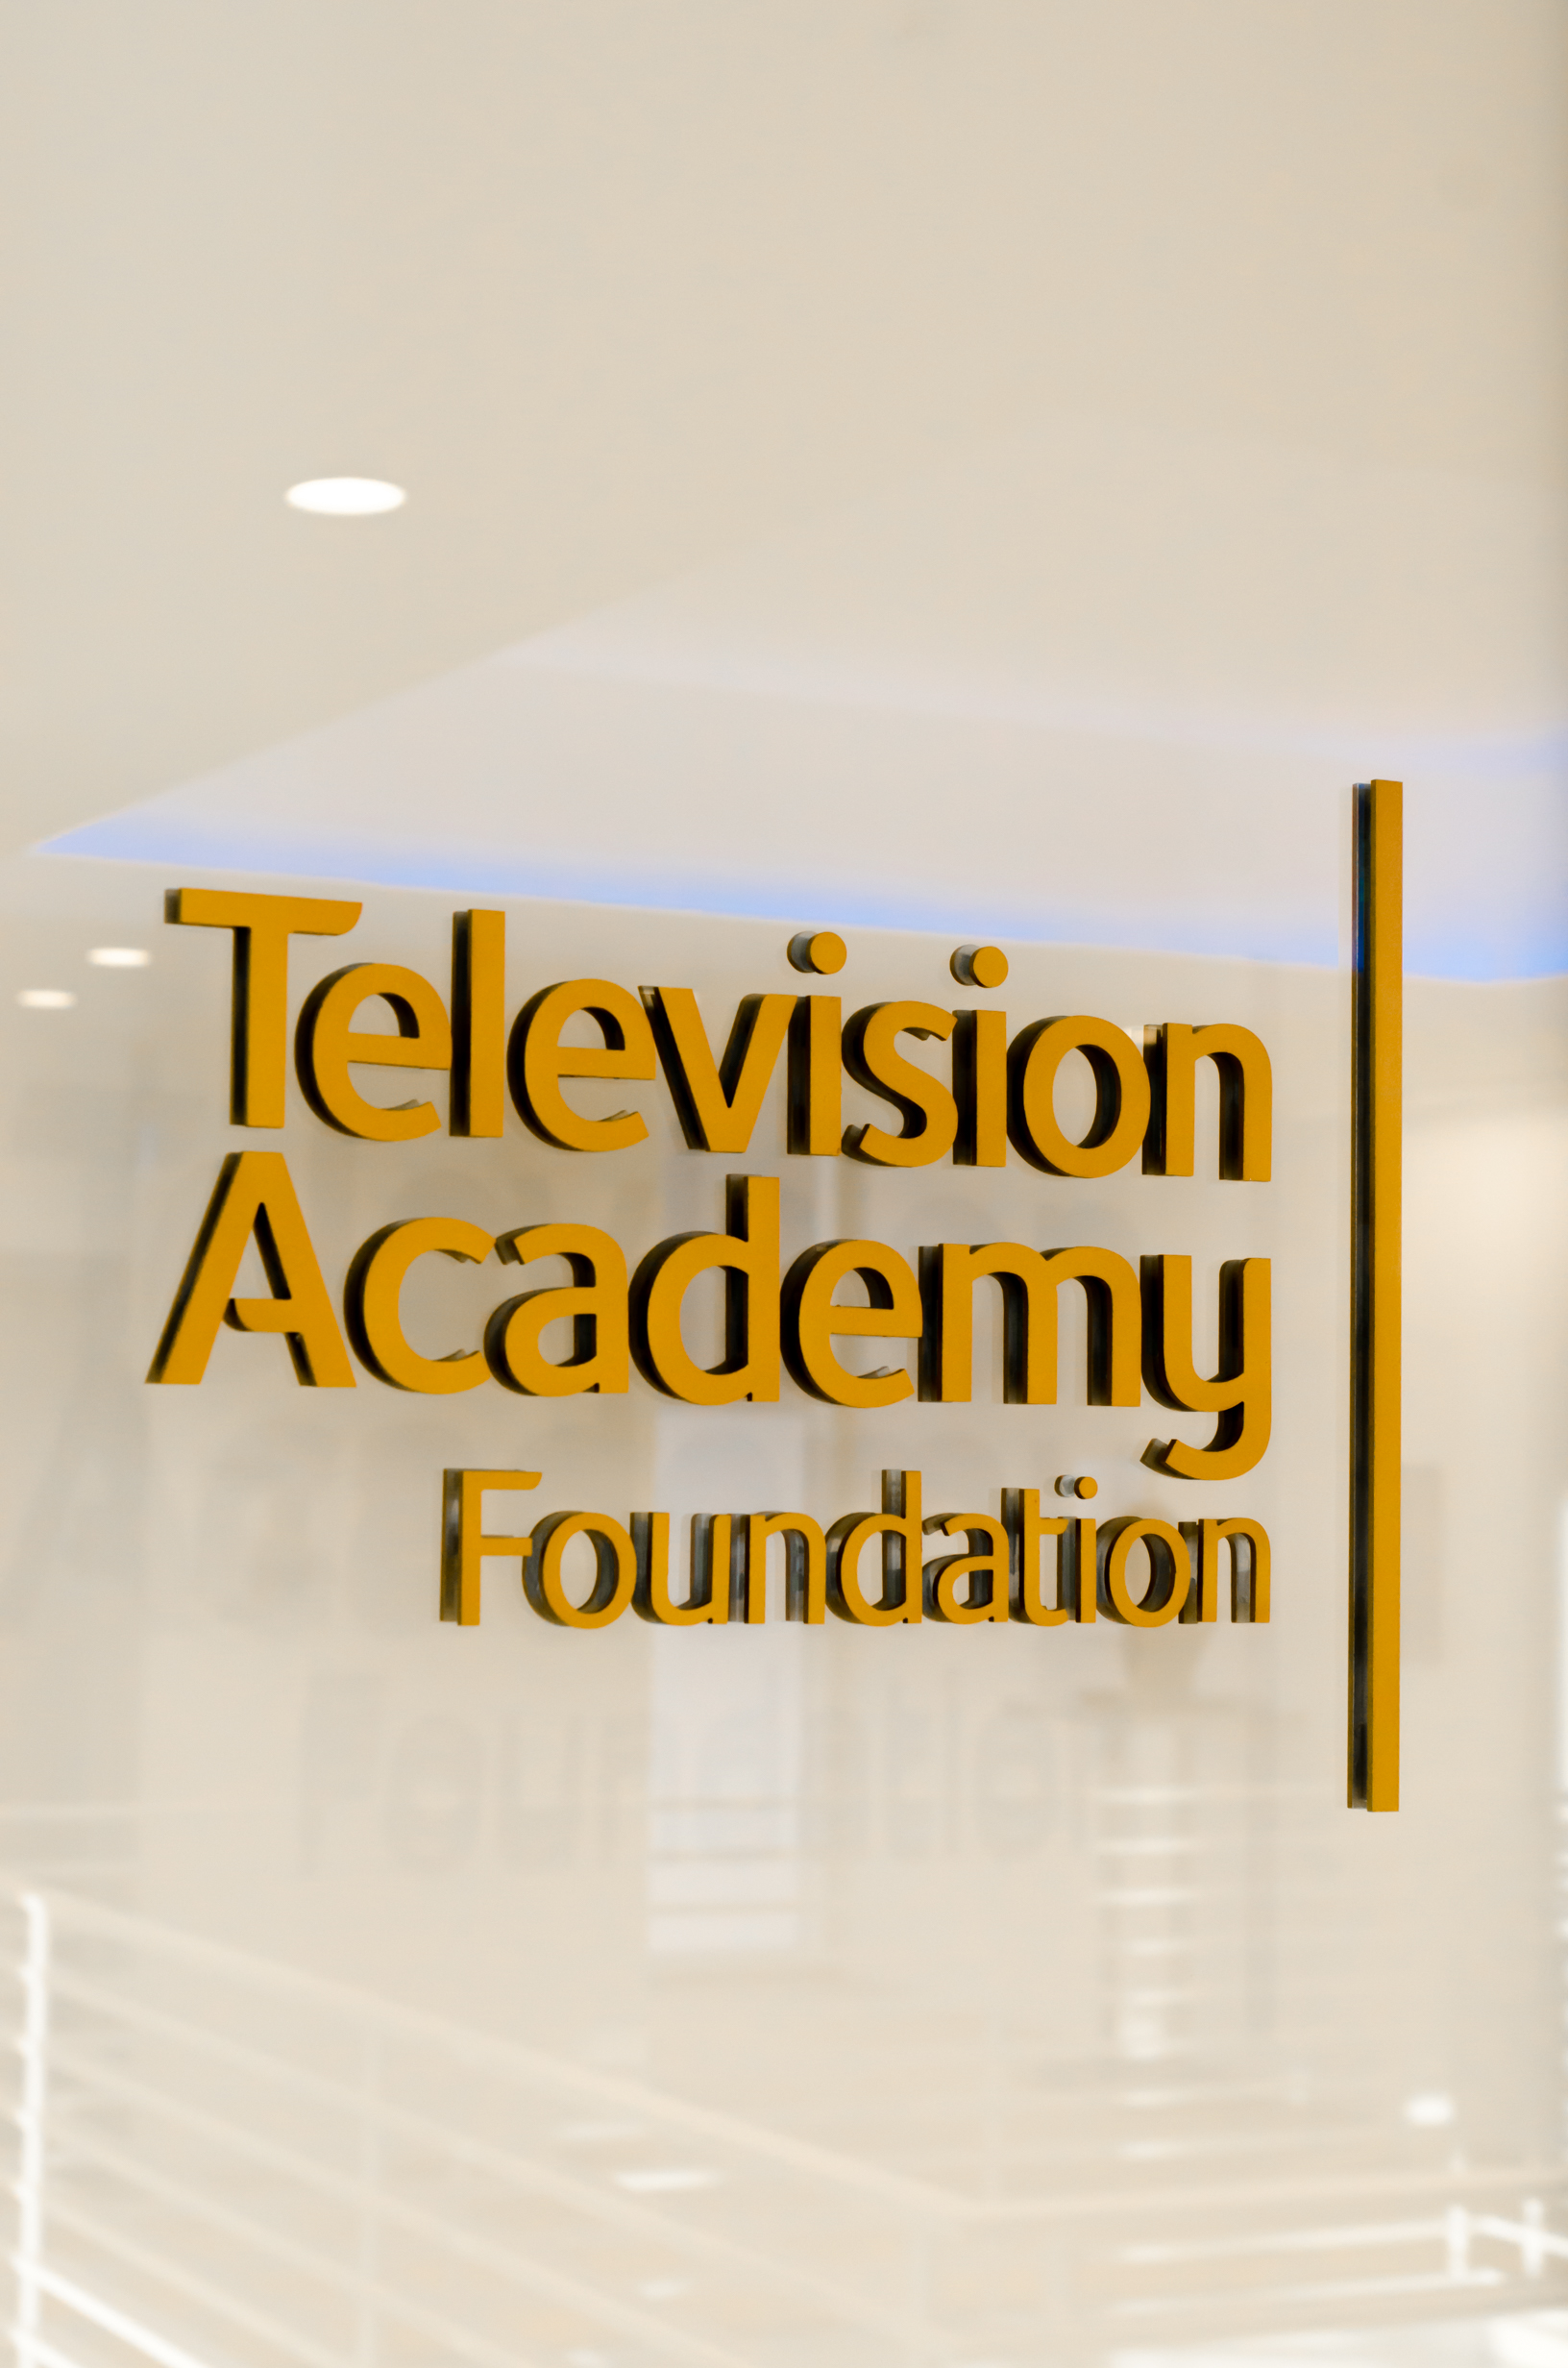 Television Academy_Foundation-3.jpg